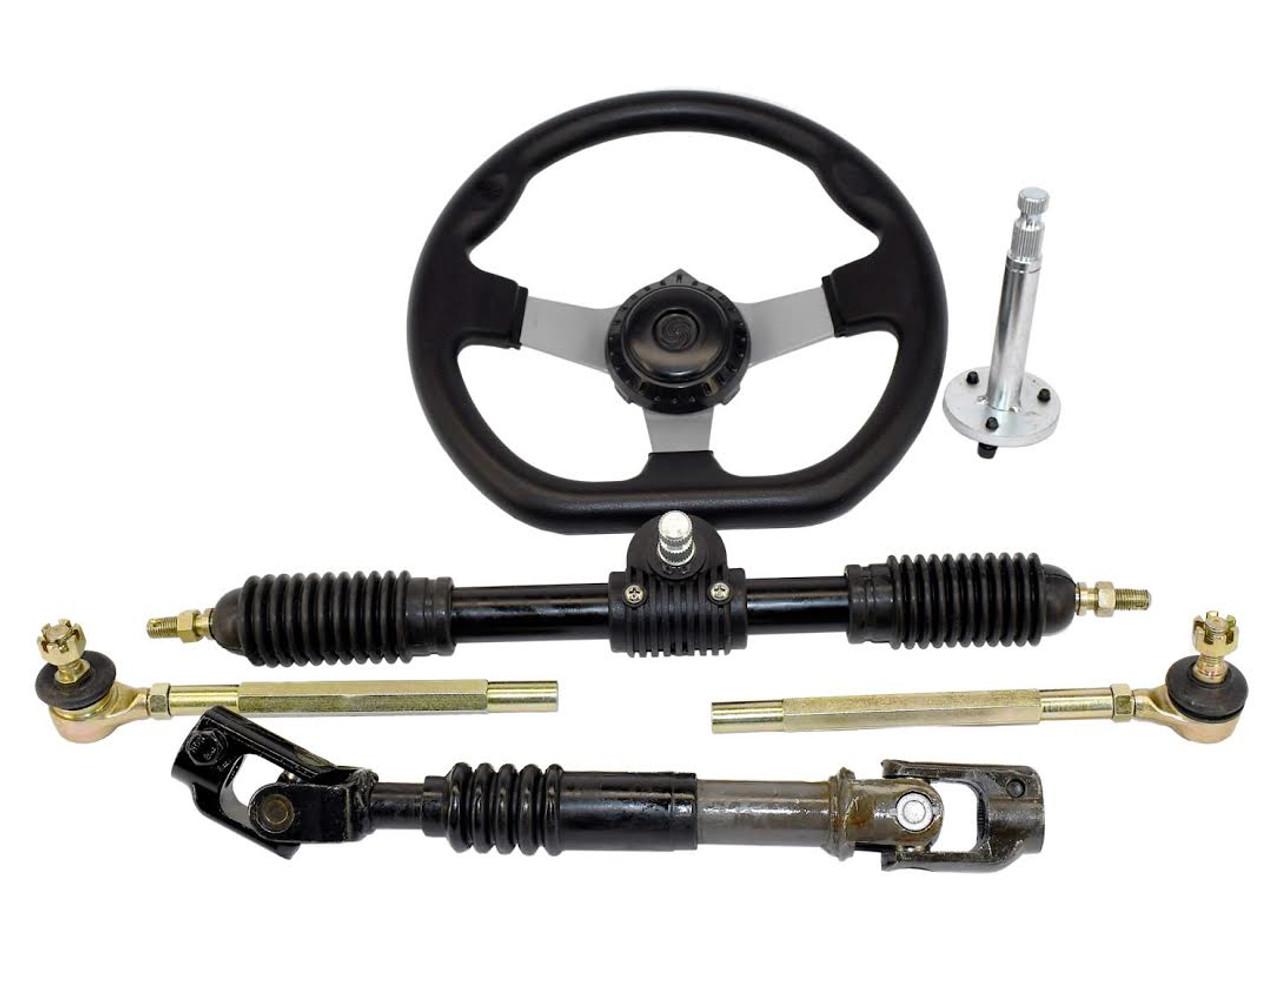 kart steering kit complete gopowersportscom